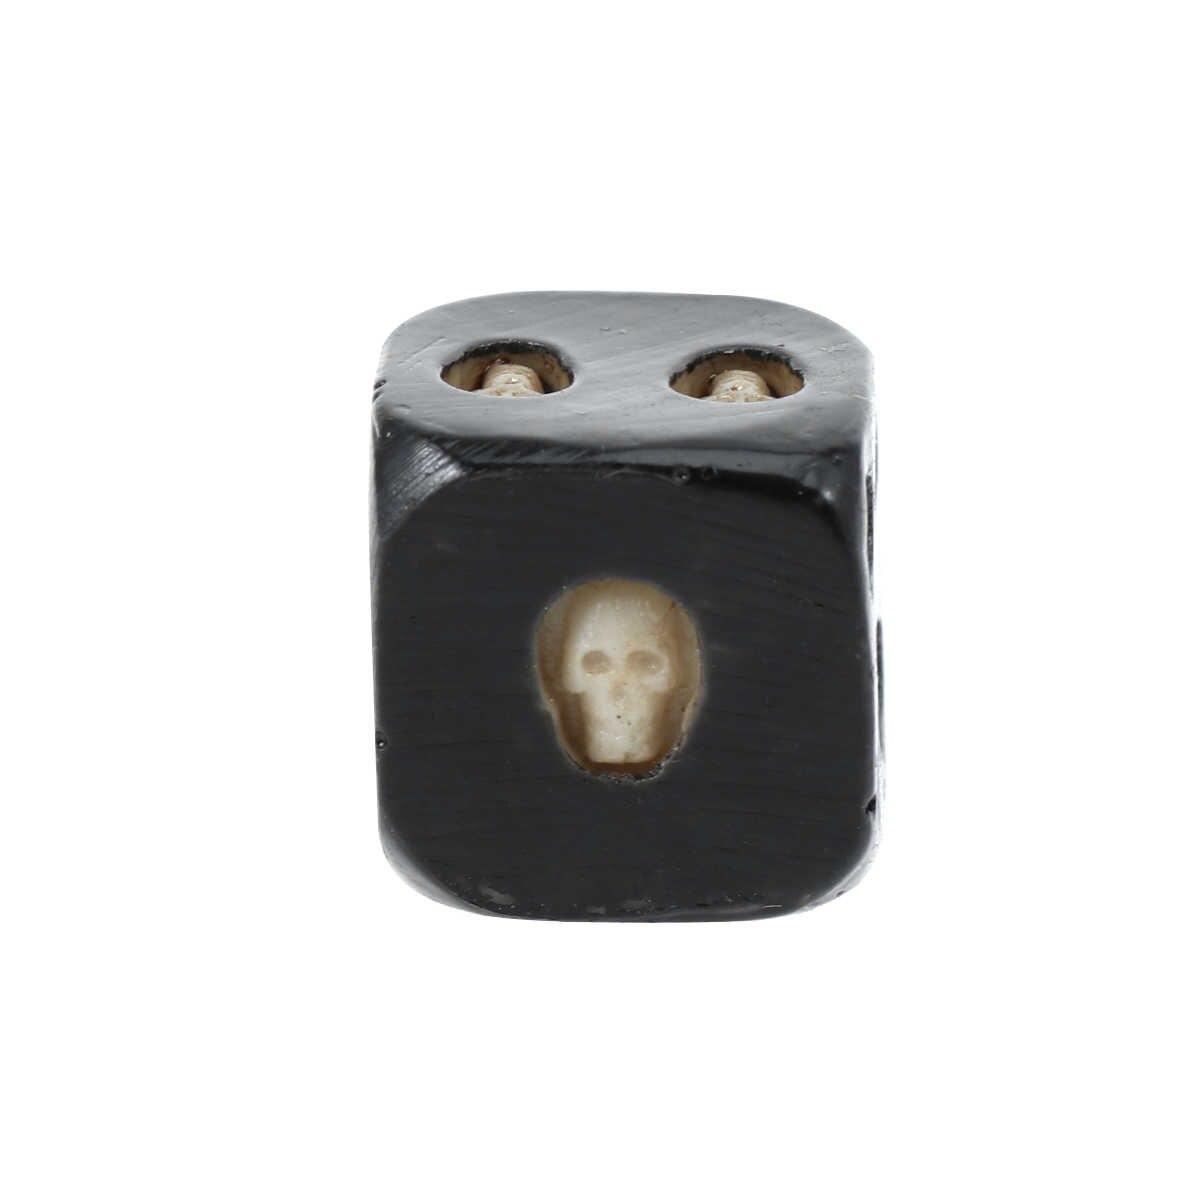 5pcs 18mm Dices ฮาโลวีนตลก 6 ด้าน Novelty Skull หัวรูปร่างลูกเต๋าสำหรับบาร์ Leisure PARTY เทศกาลเกม